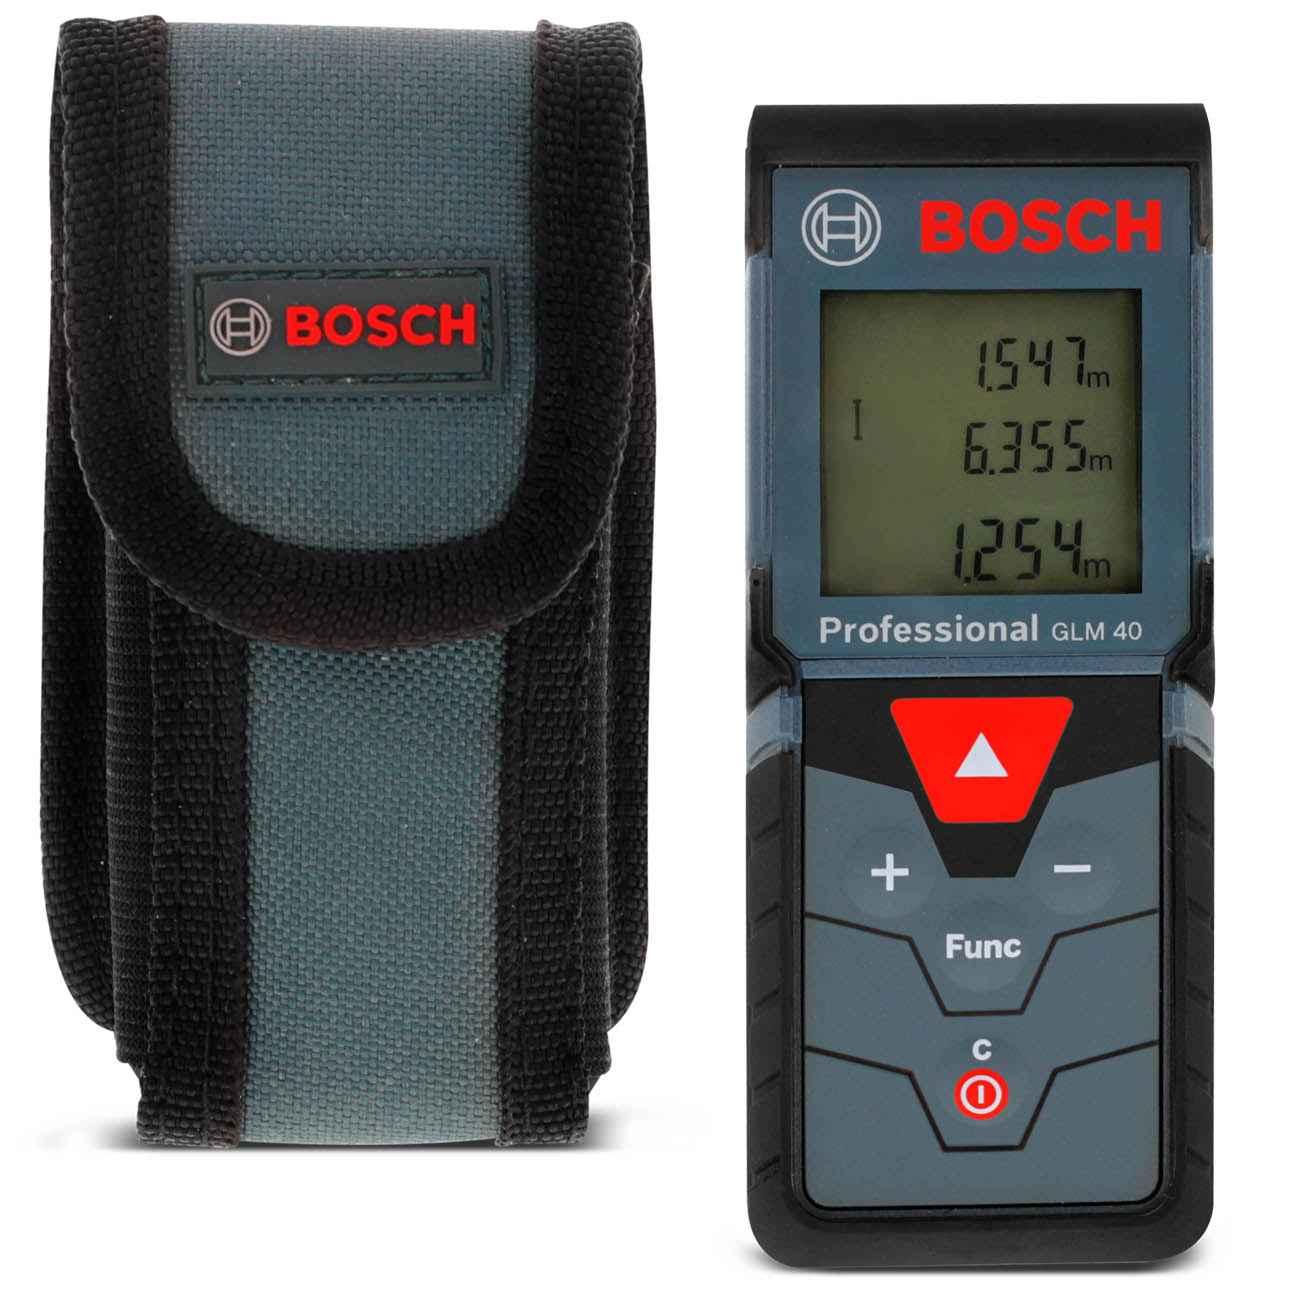 Medidor Trena A Laser 40 Metros Glm40 Profissional Bosch